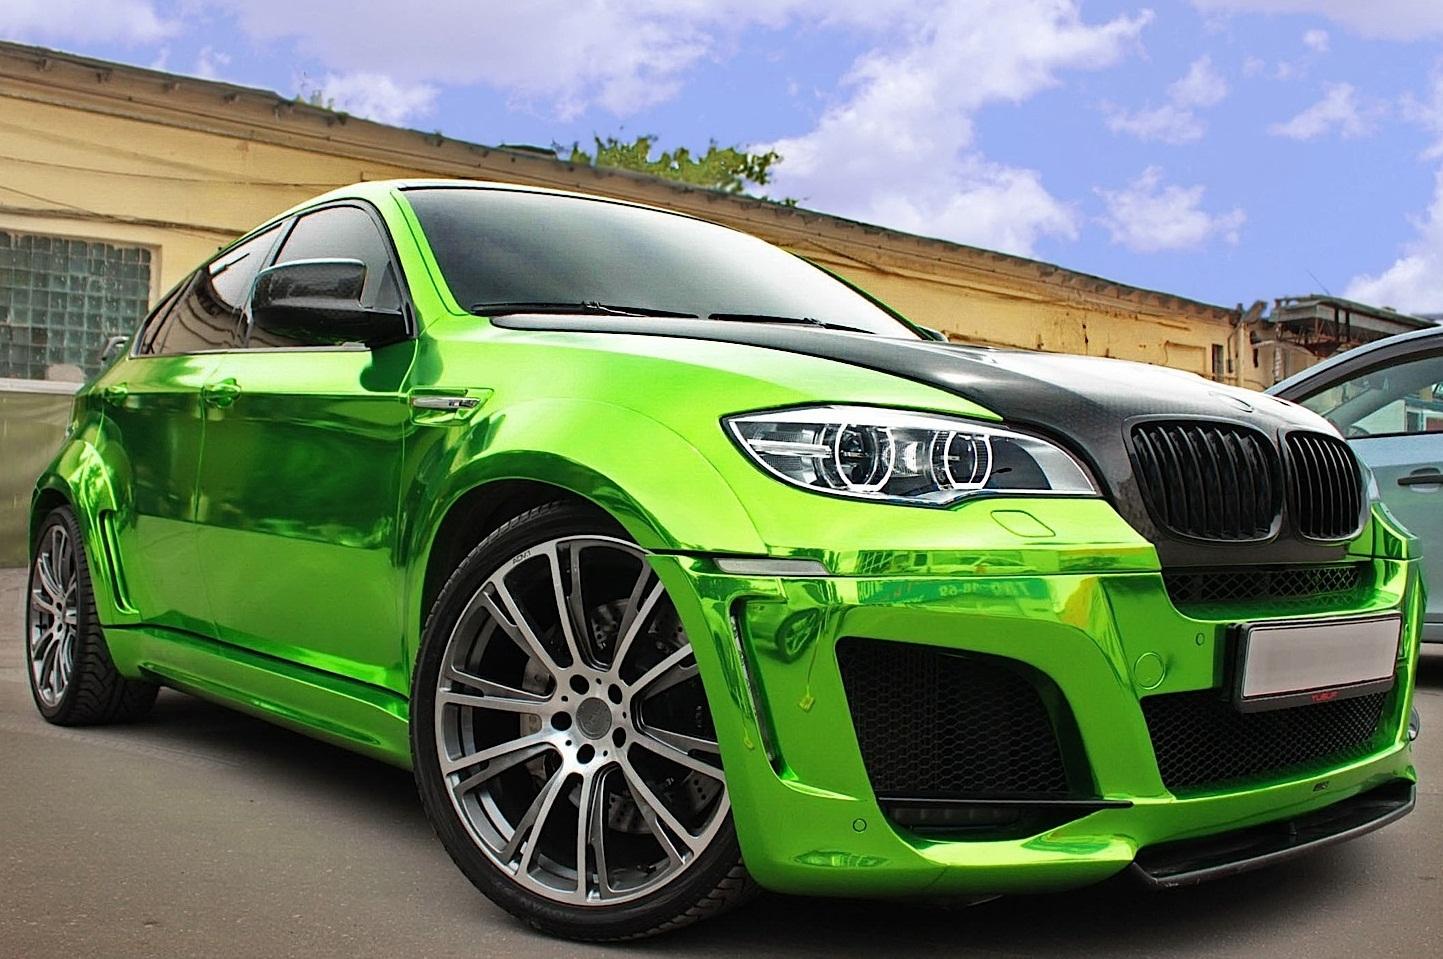 Green Cars 171 Cars